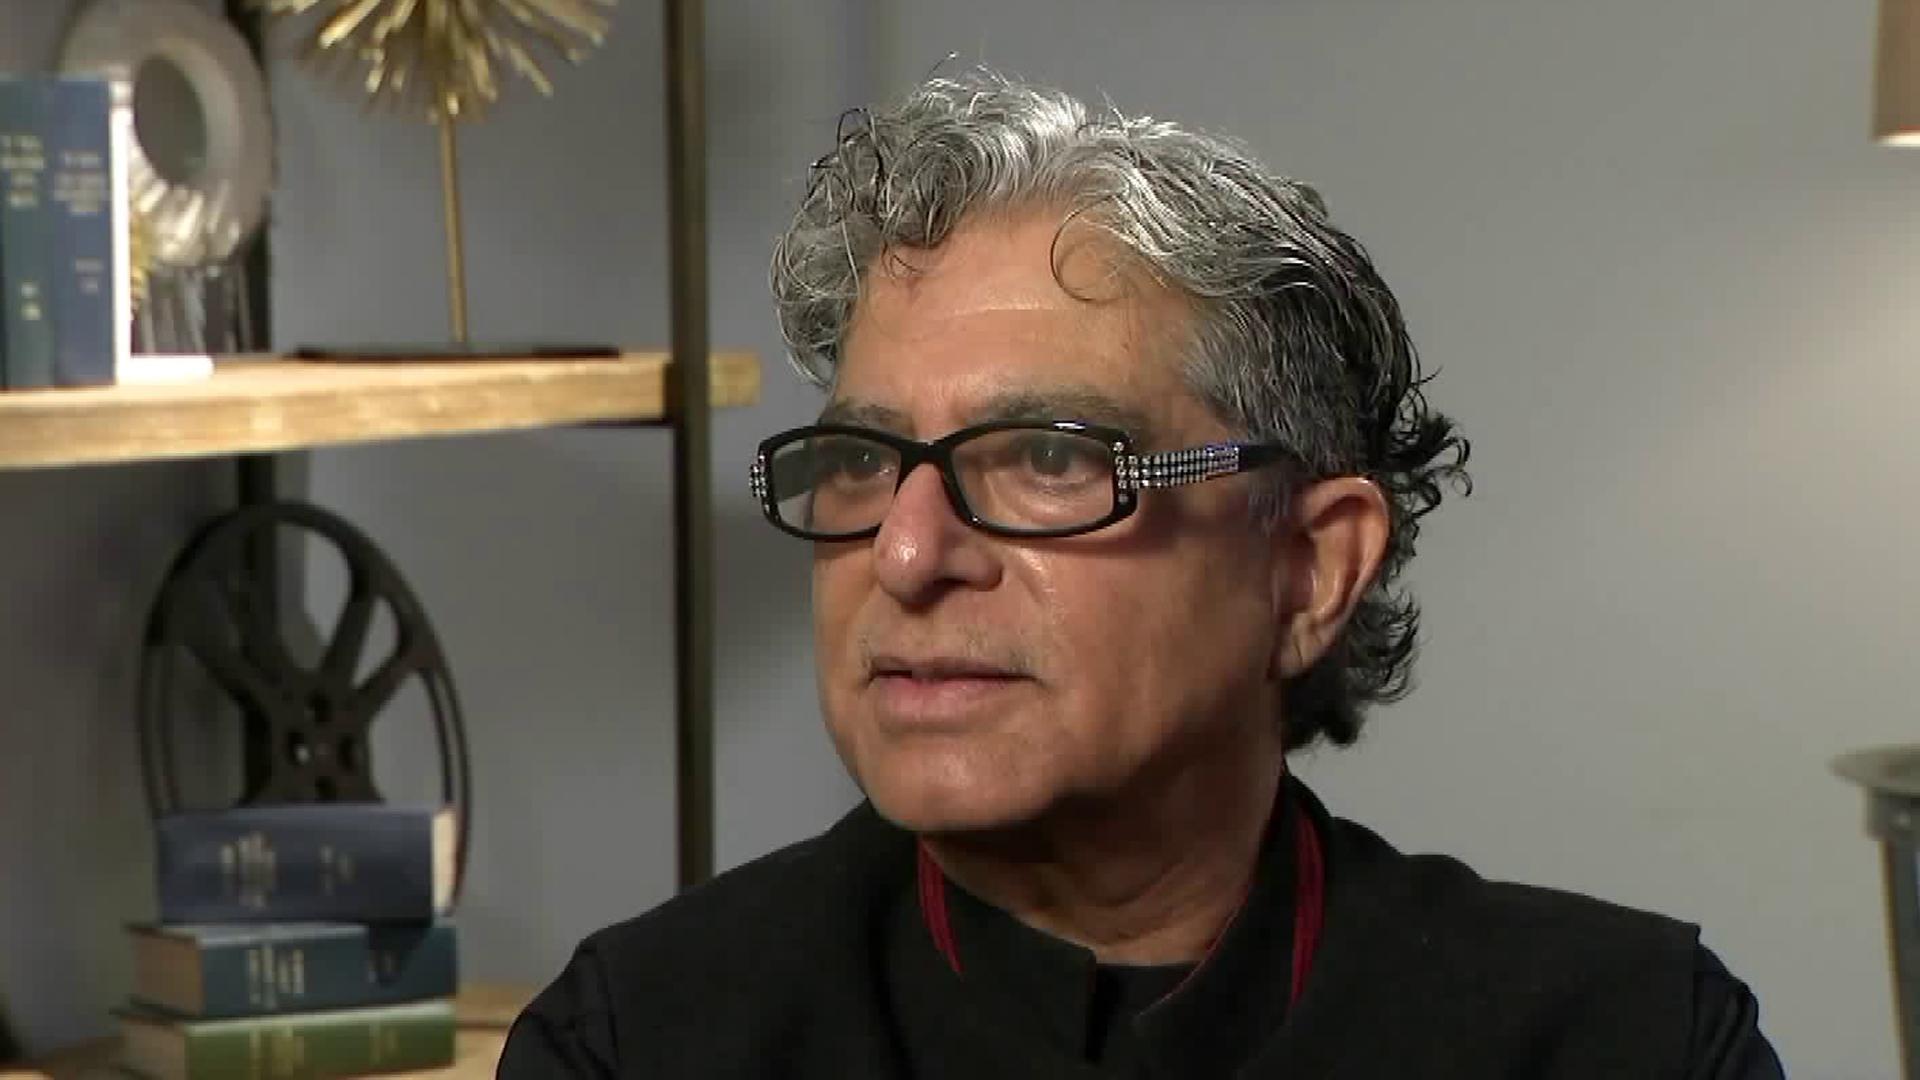 Deepak Chopra speaks with Christina Pascucci for the KTLA 5 News on Nov. 20, 2018. (Credit: KTLA)